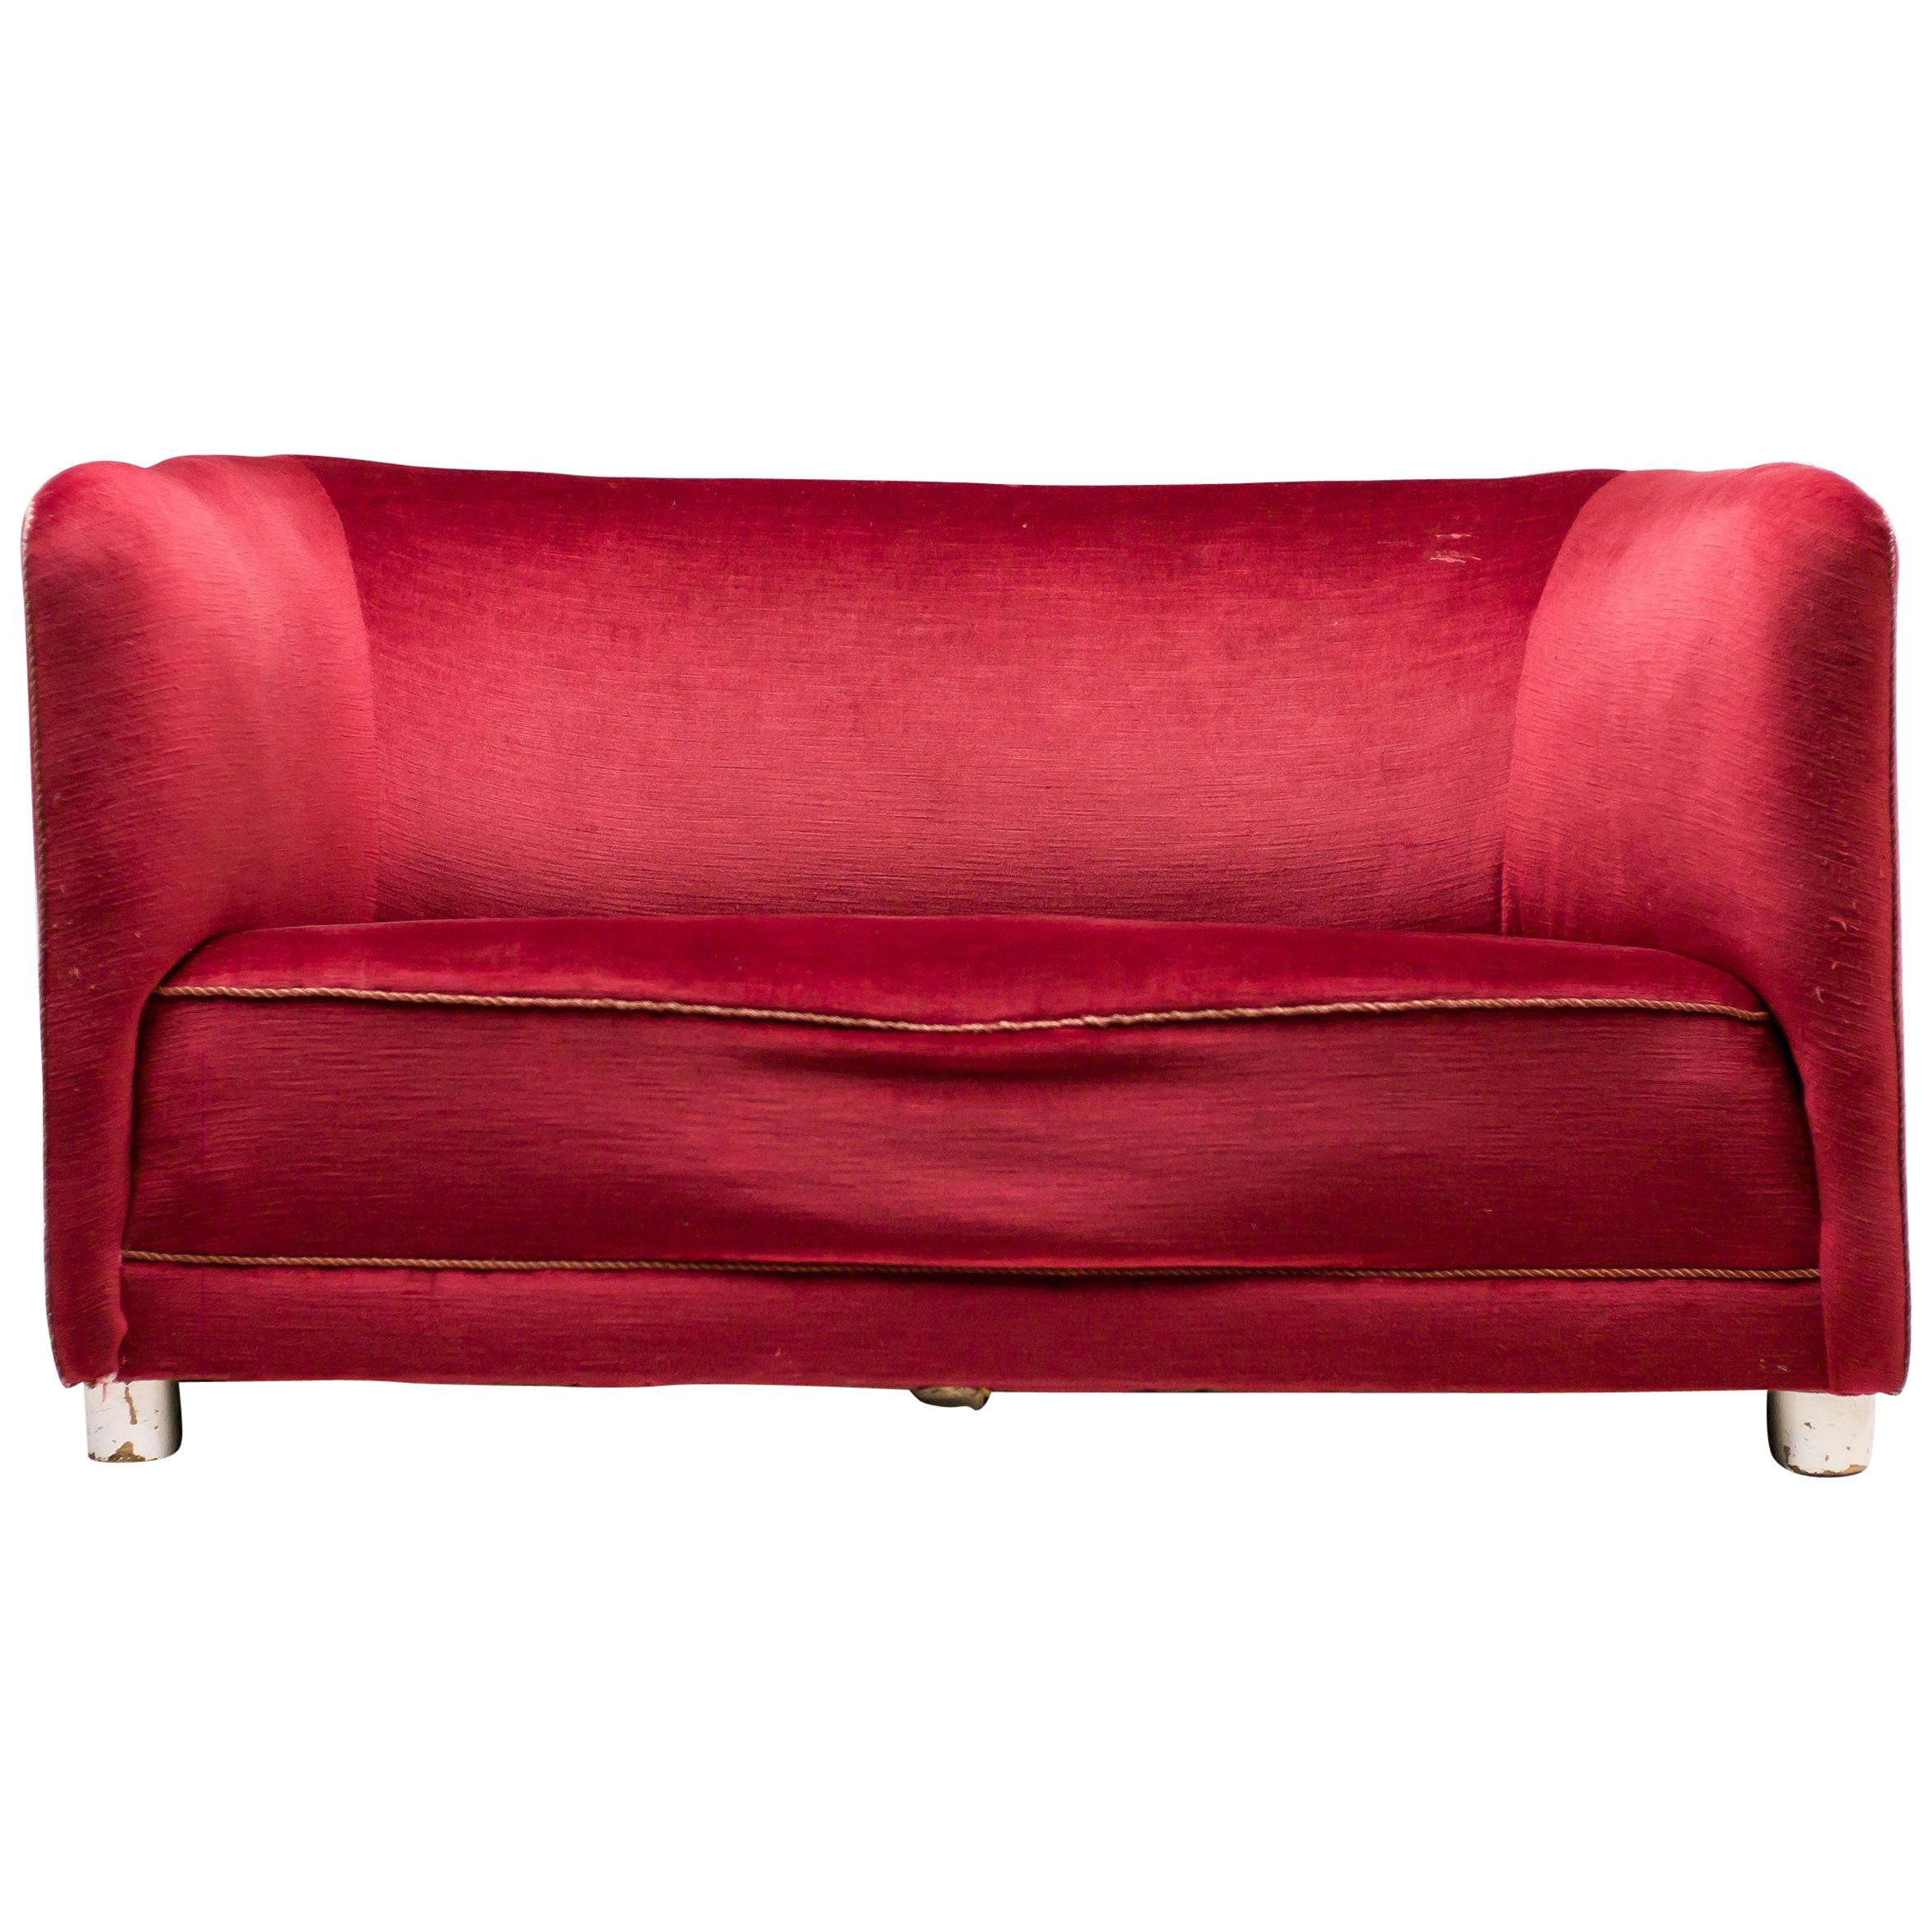 Red Velvet Sofa by Ole Wanscher